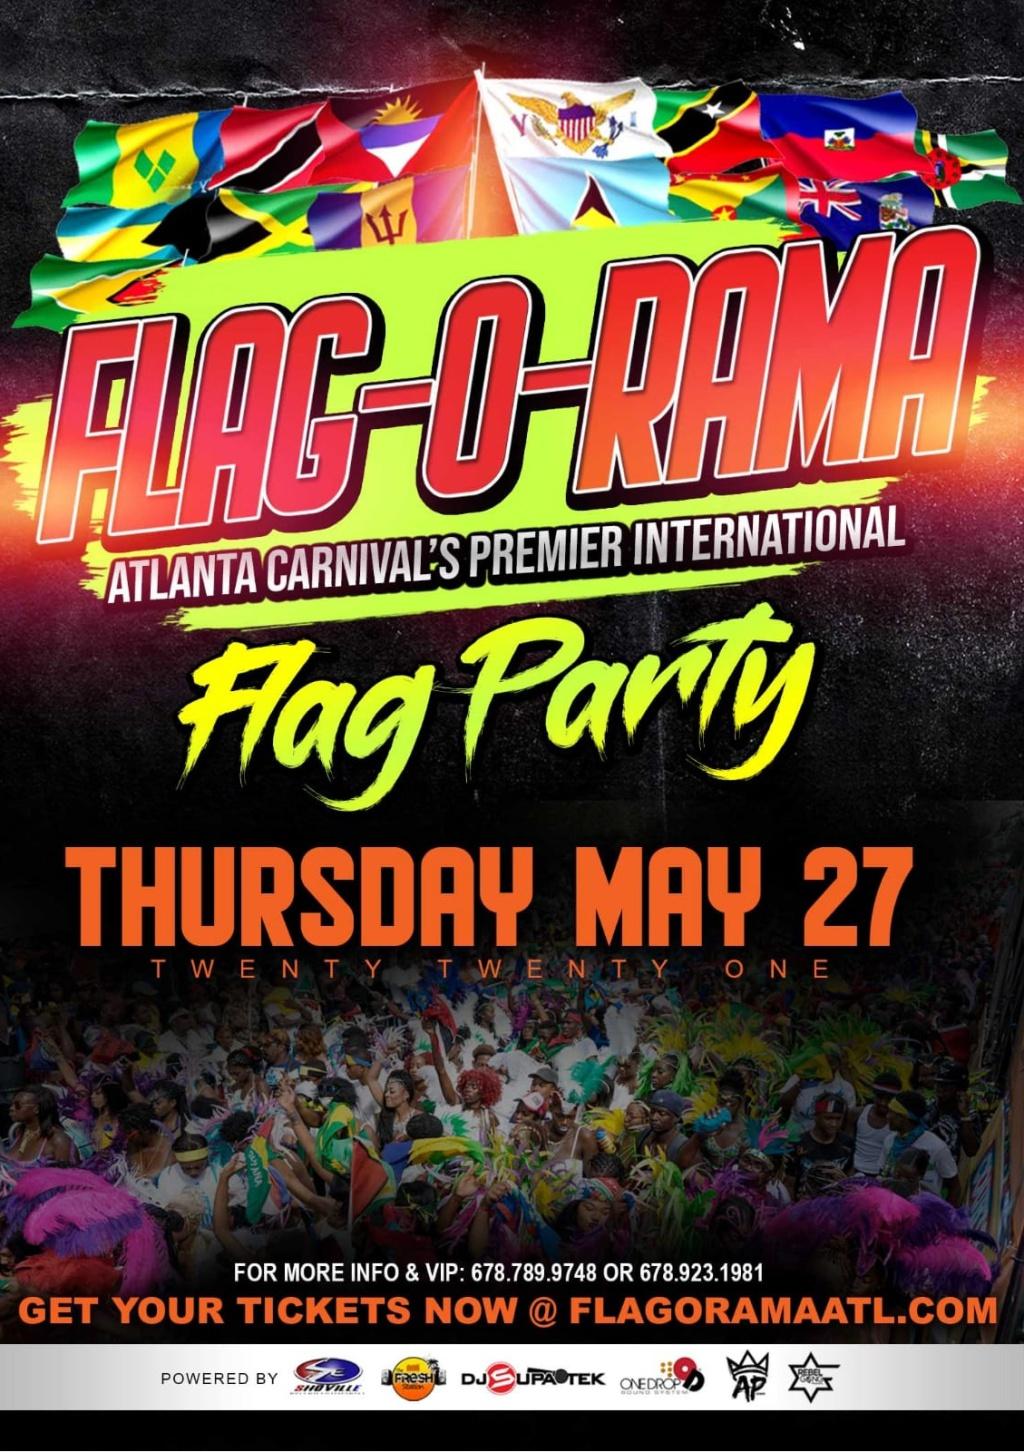 Flag-O-Rama flyer or graphic.